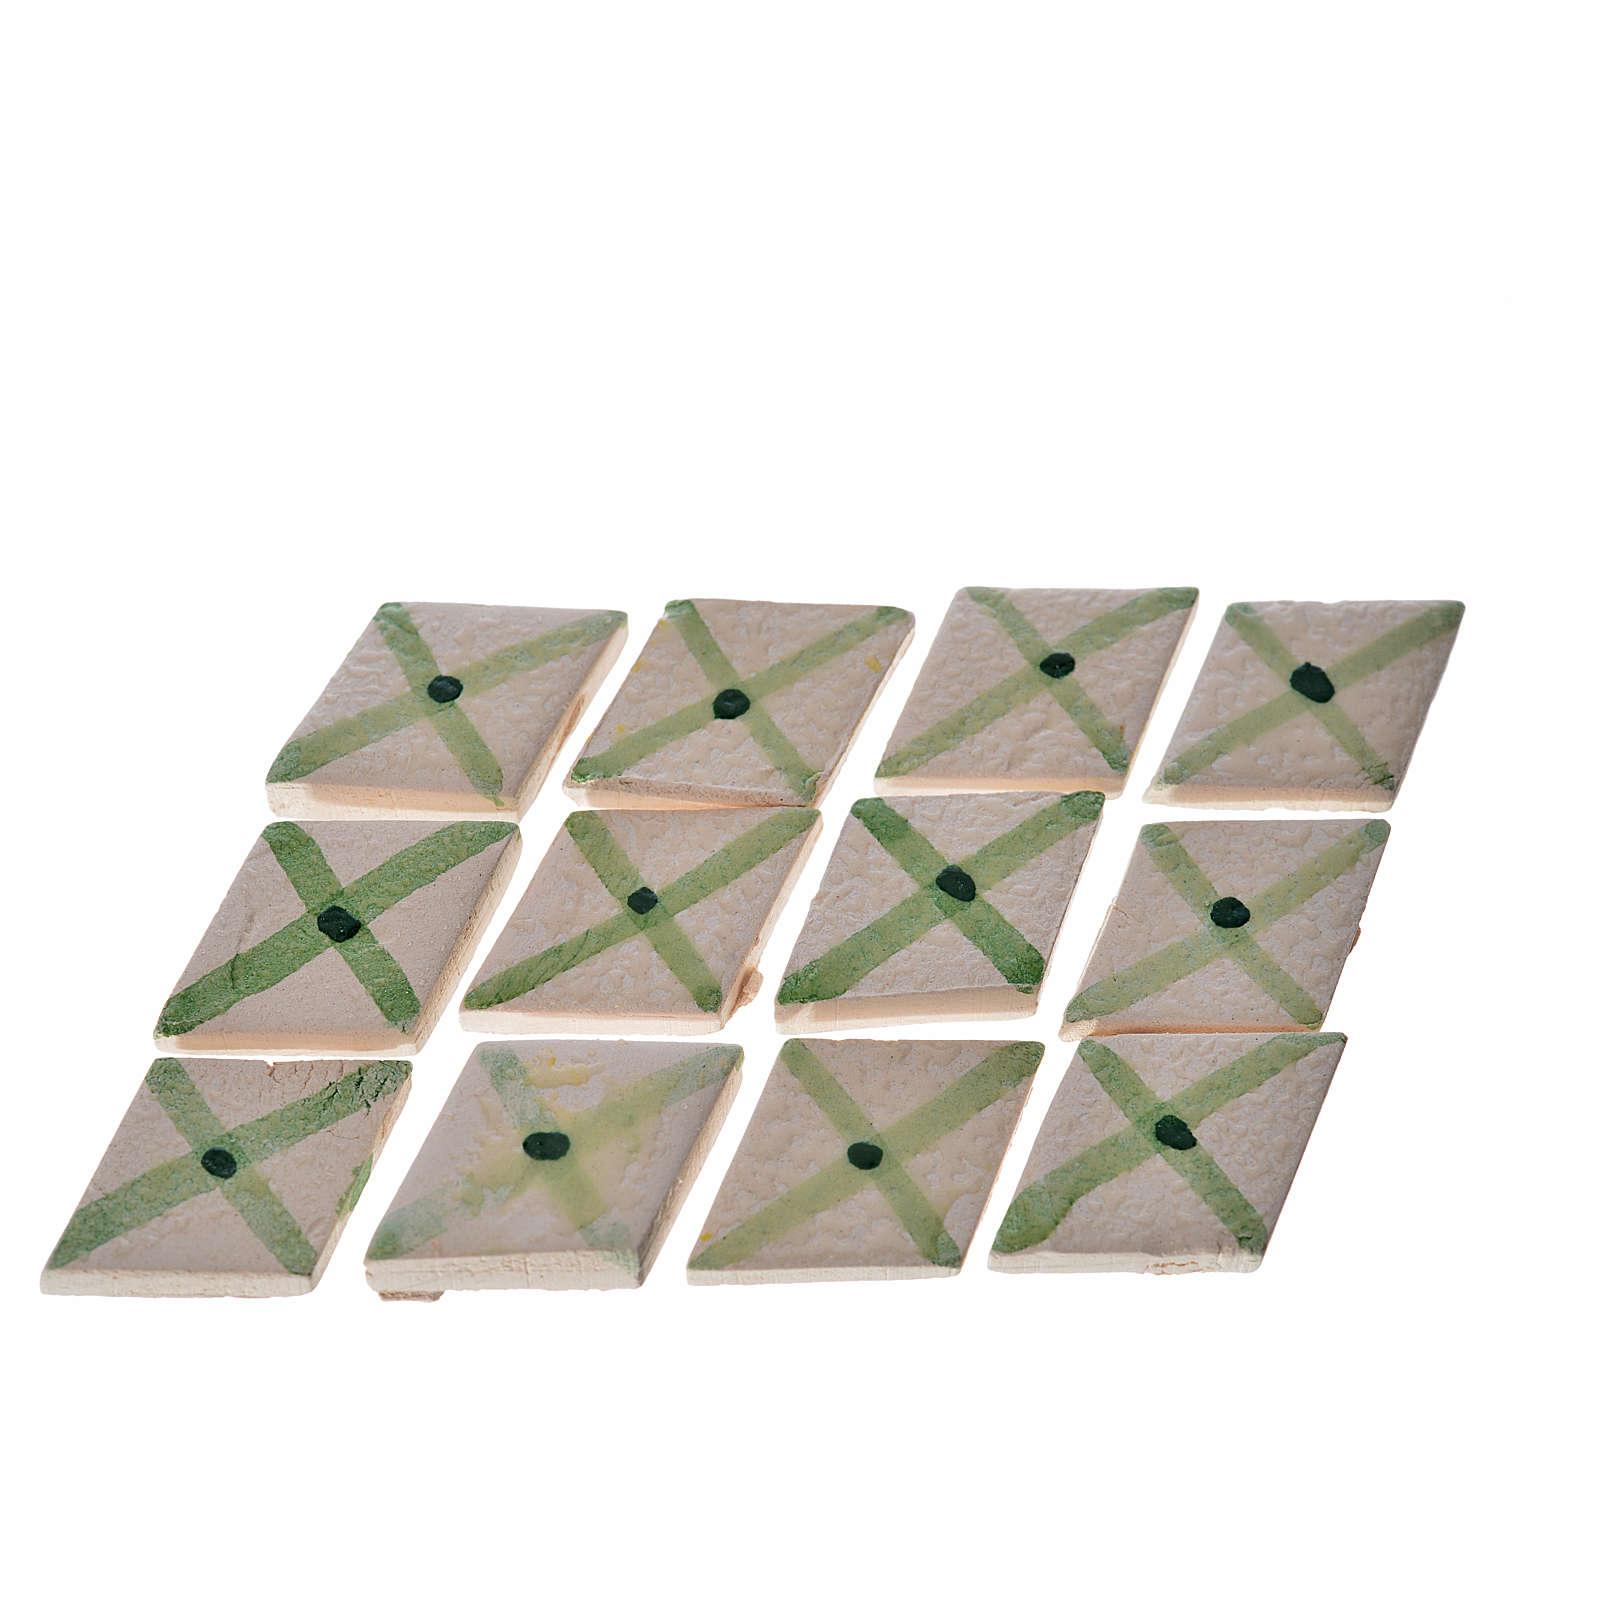 Nativity accessory, enamelled terracotta tiles, diamond, 60pcs, 4